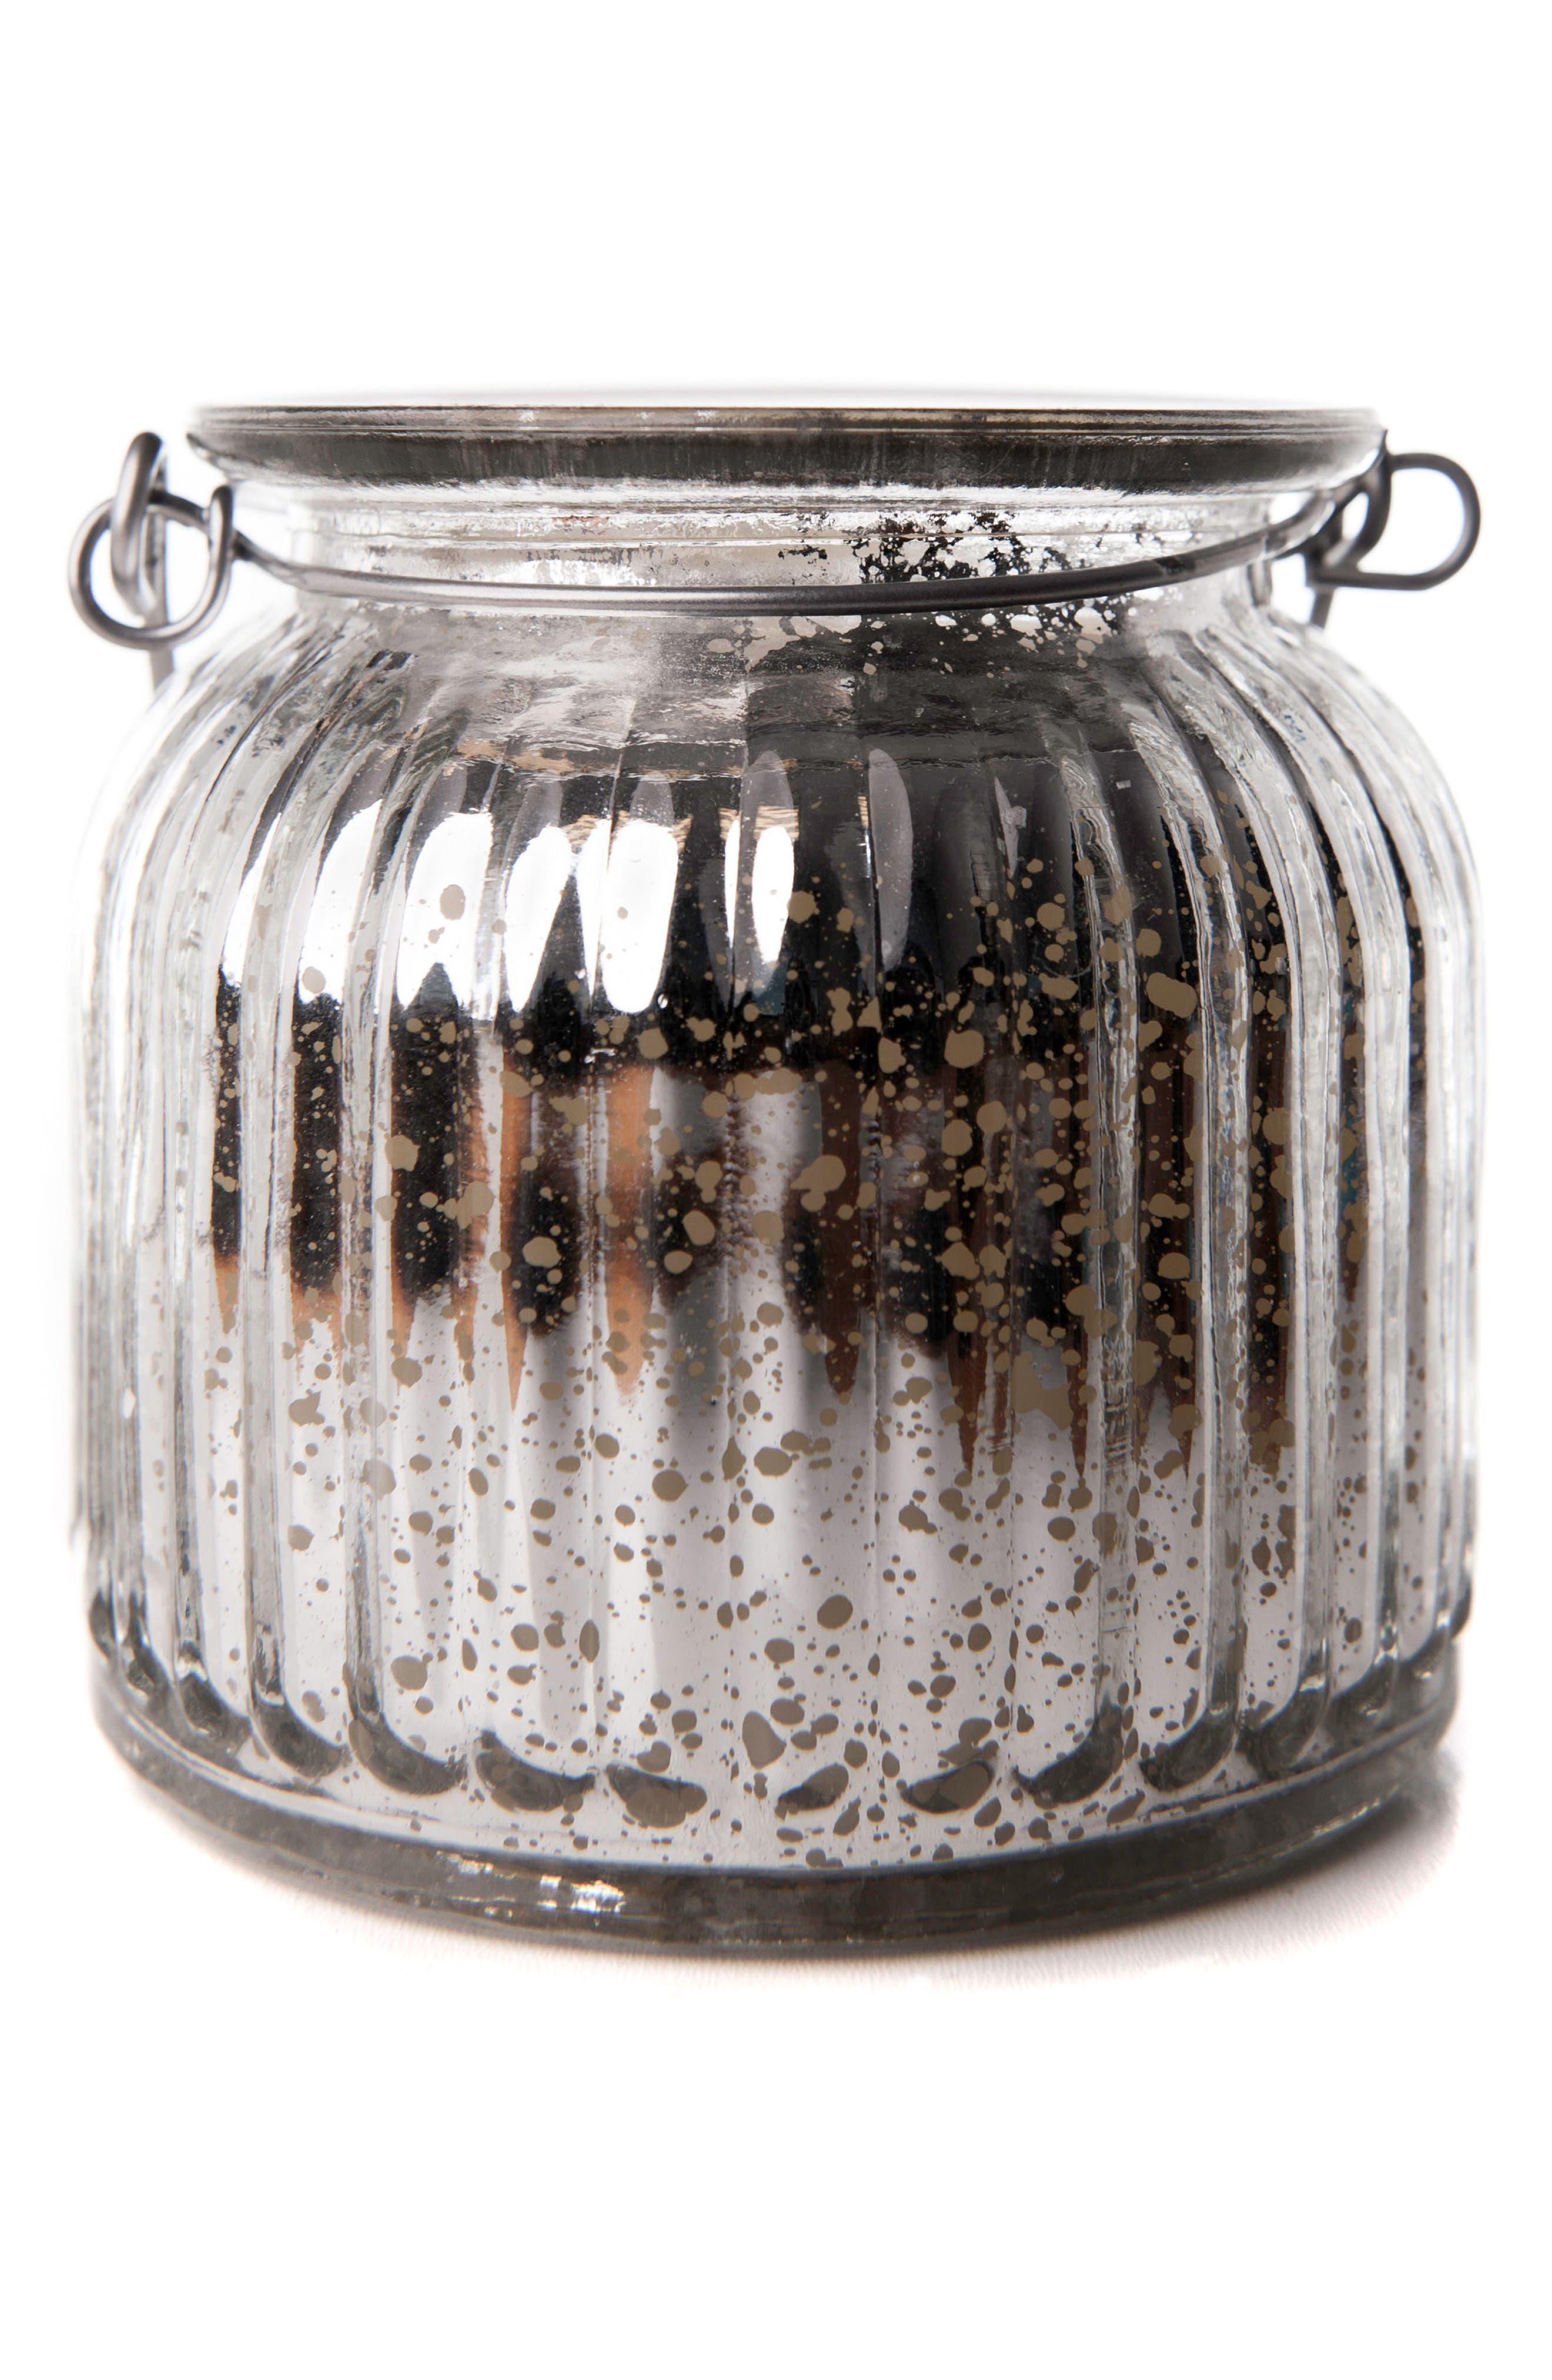 Alternate Image 1 Selected - Amazing Flameless Candle Mercury Glass Jar Flameless Candle